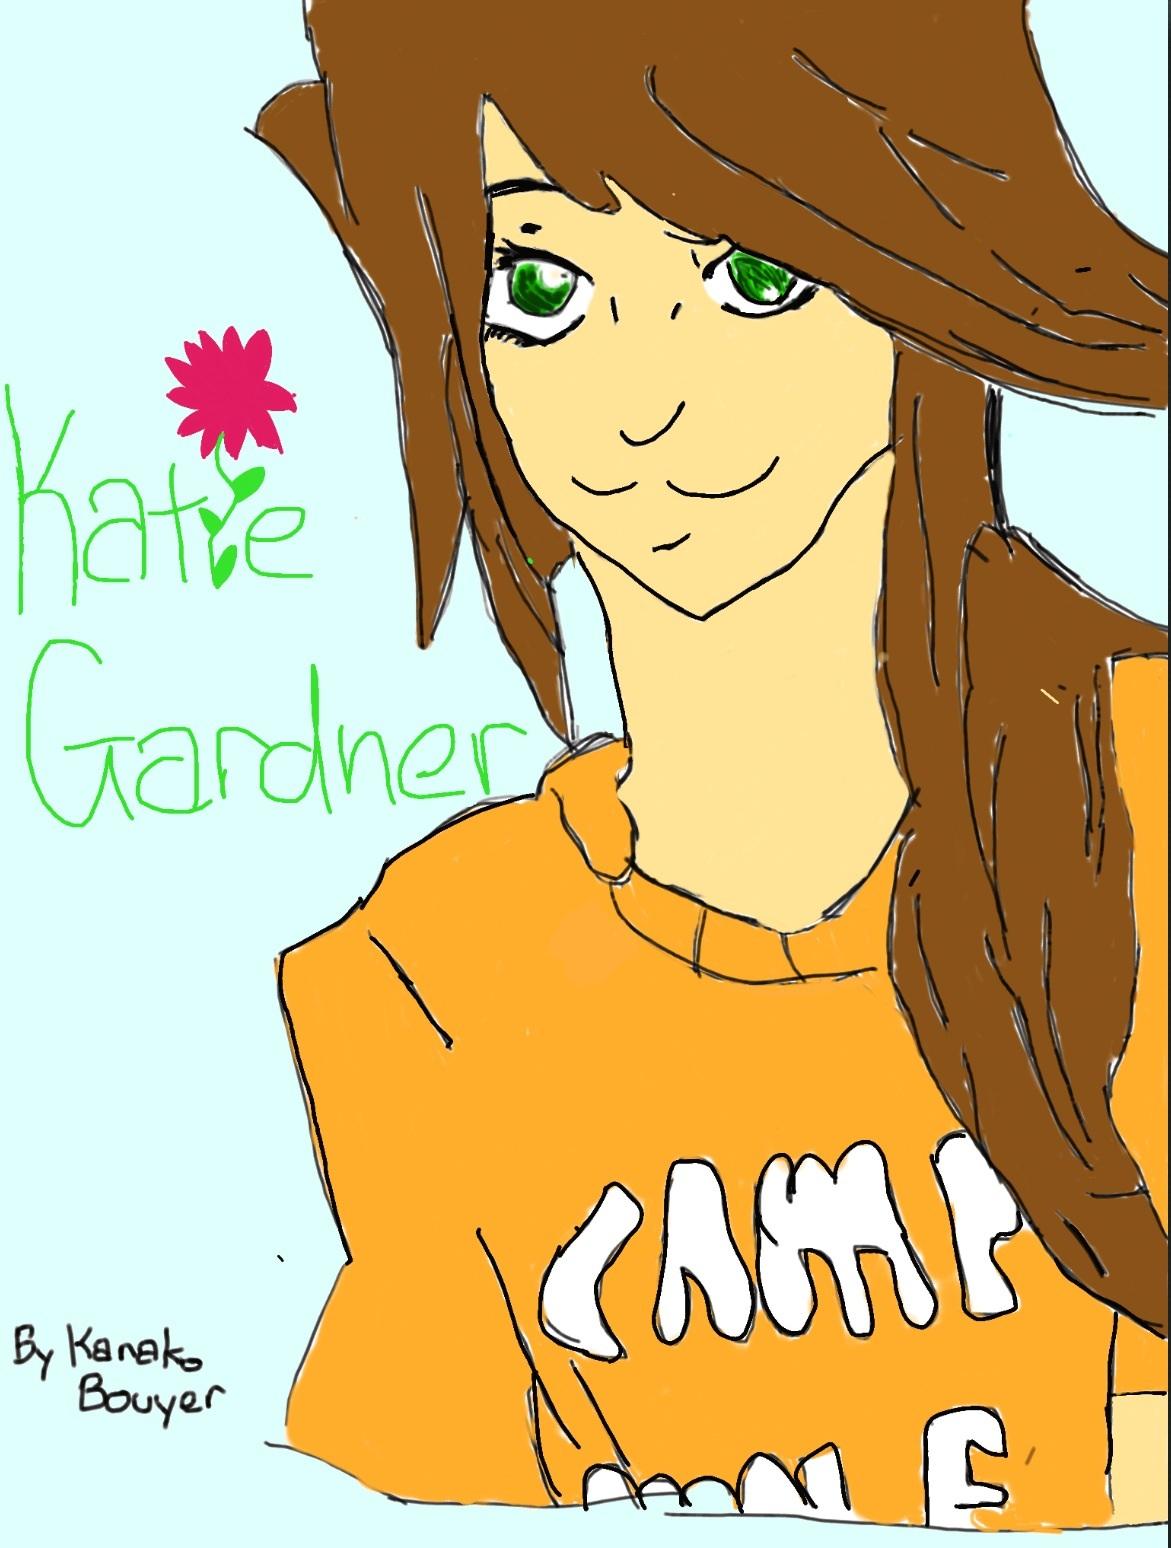 Katie gardner percy jackson